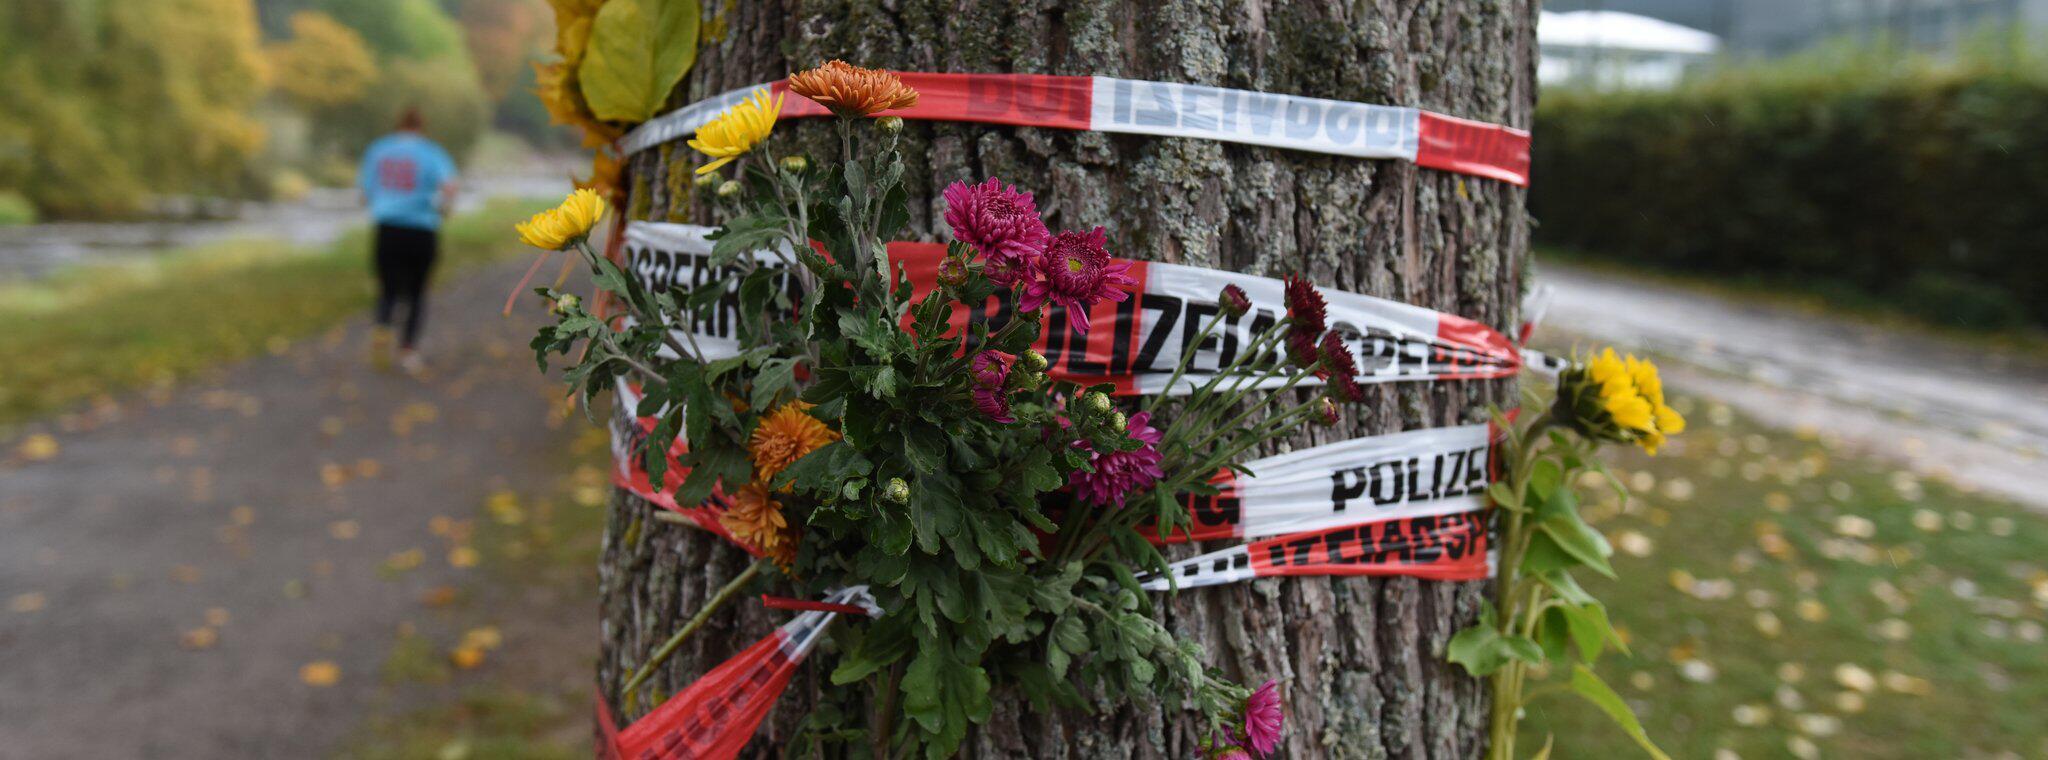 Bild zu Mordfall Freiburger Studentin